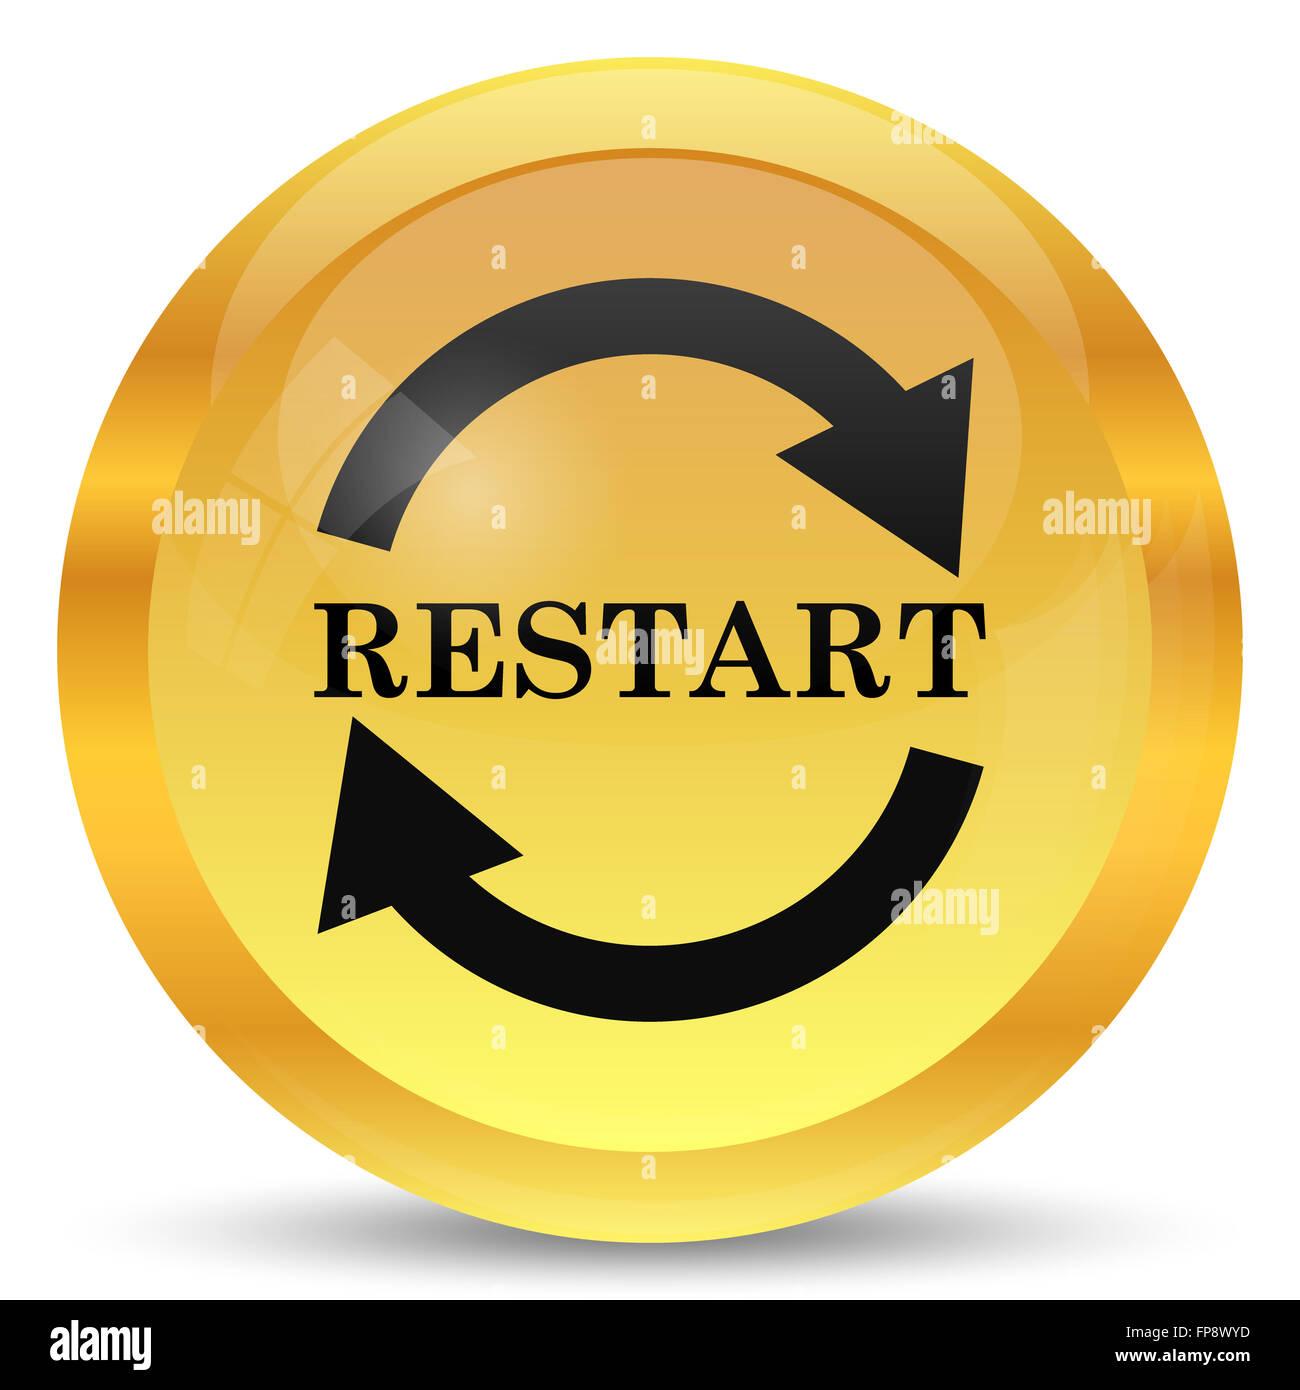 restart icon internet button on white background stock photo alamy https www alamy com stock photo restart icon internet button on white background 99770257 html